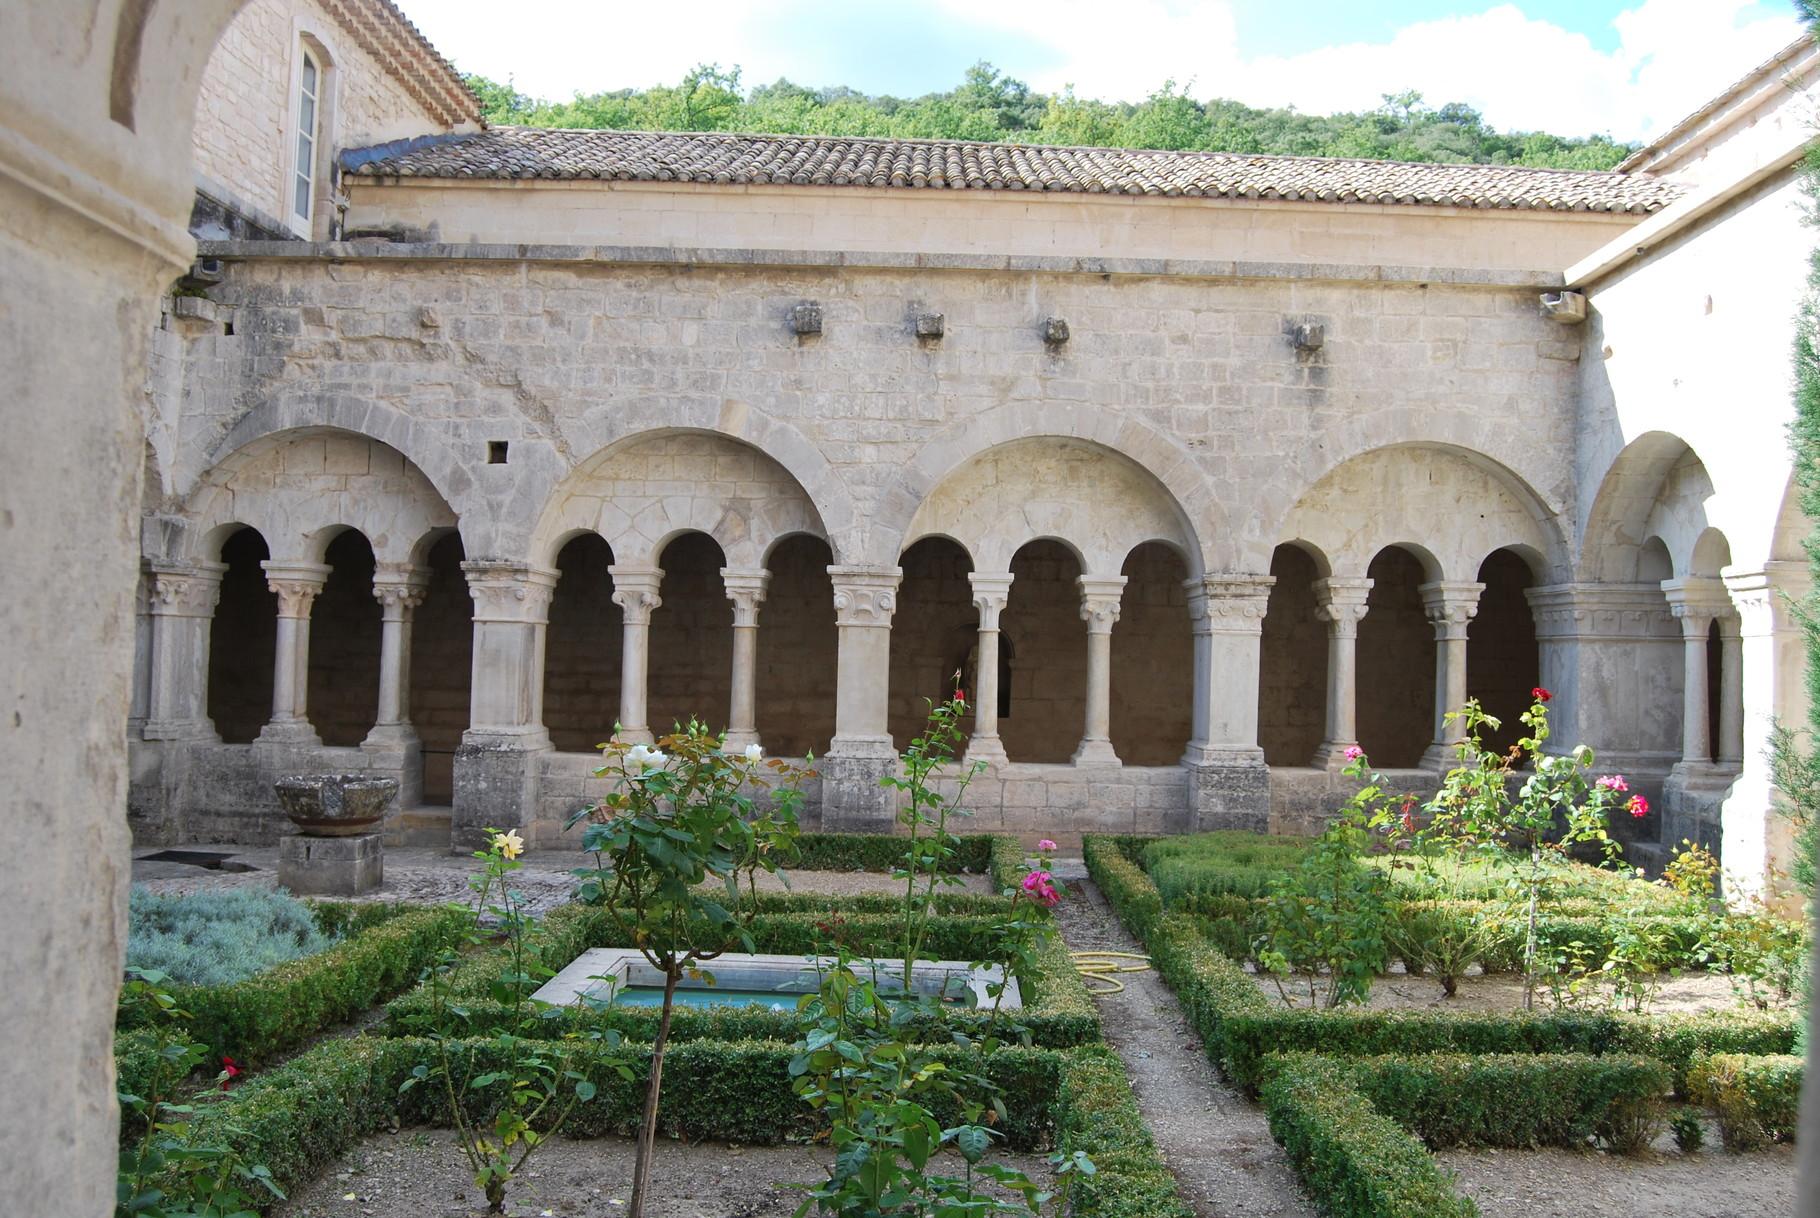 Le cloître de l'abbaye de Sénanque